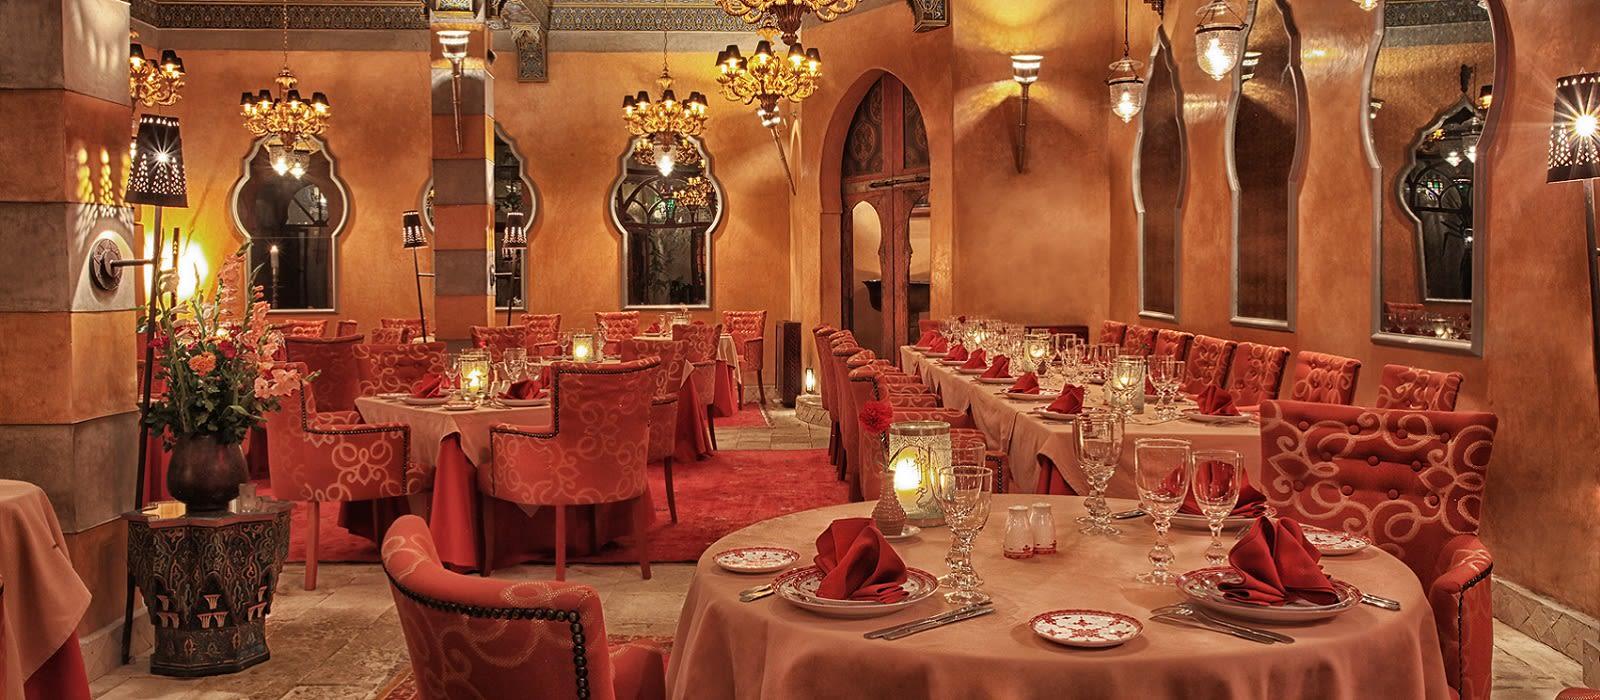 Hotel La Maison Arabe Marokko